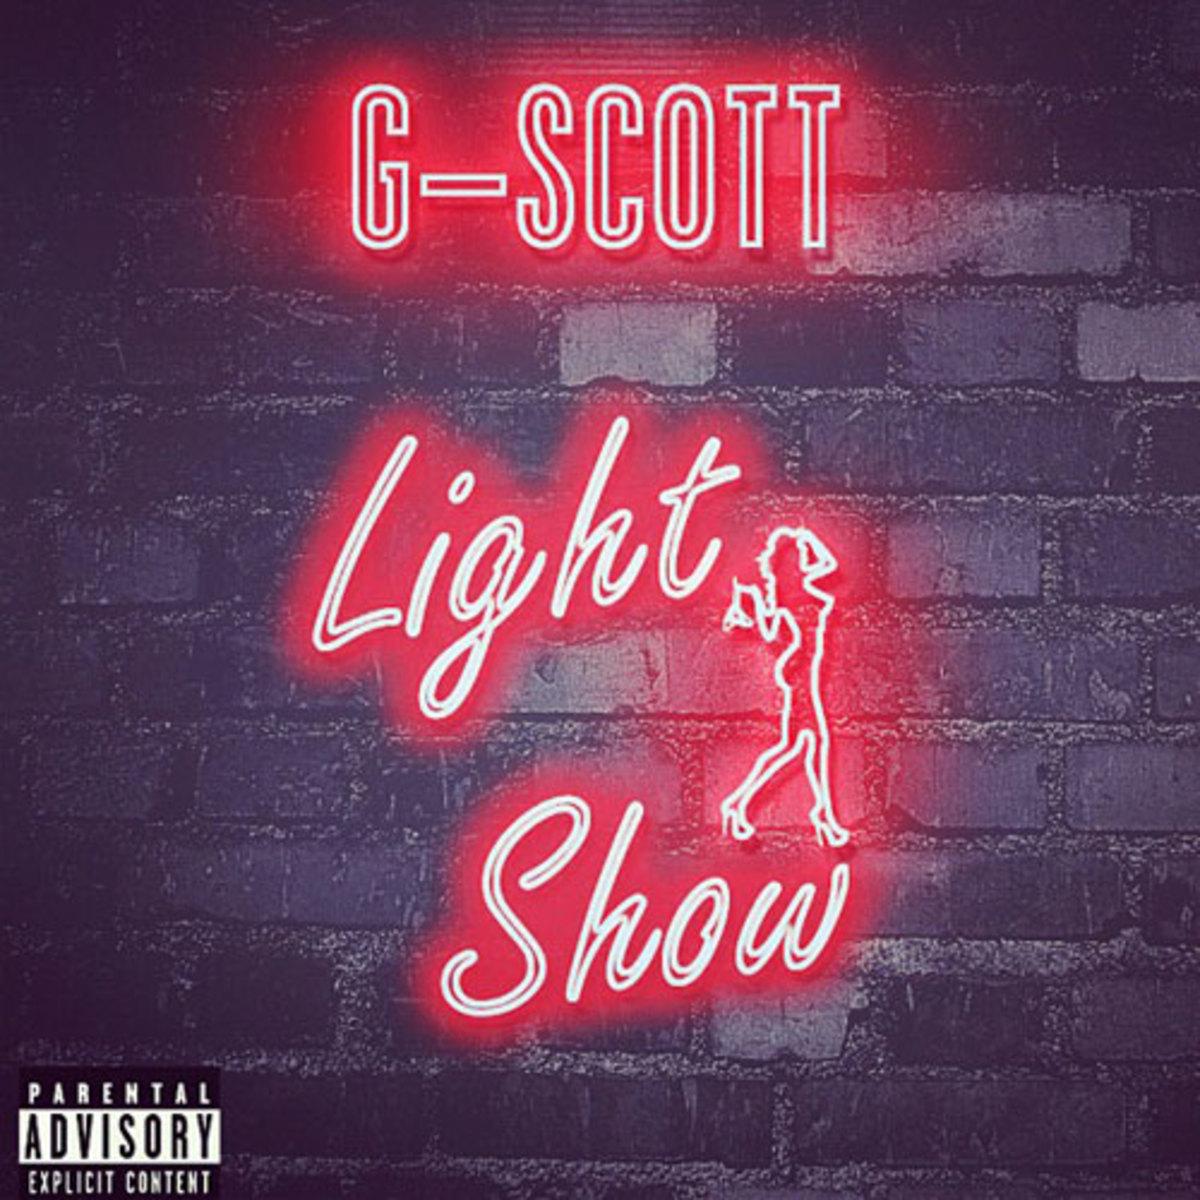 gscott-lightshow.jpg